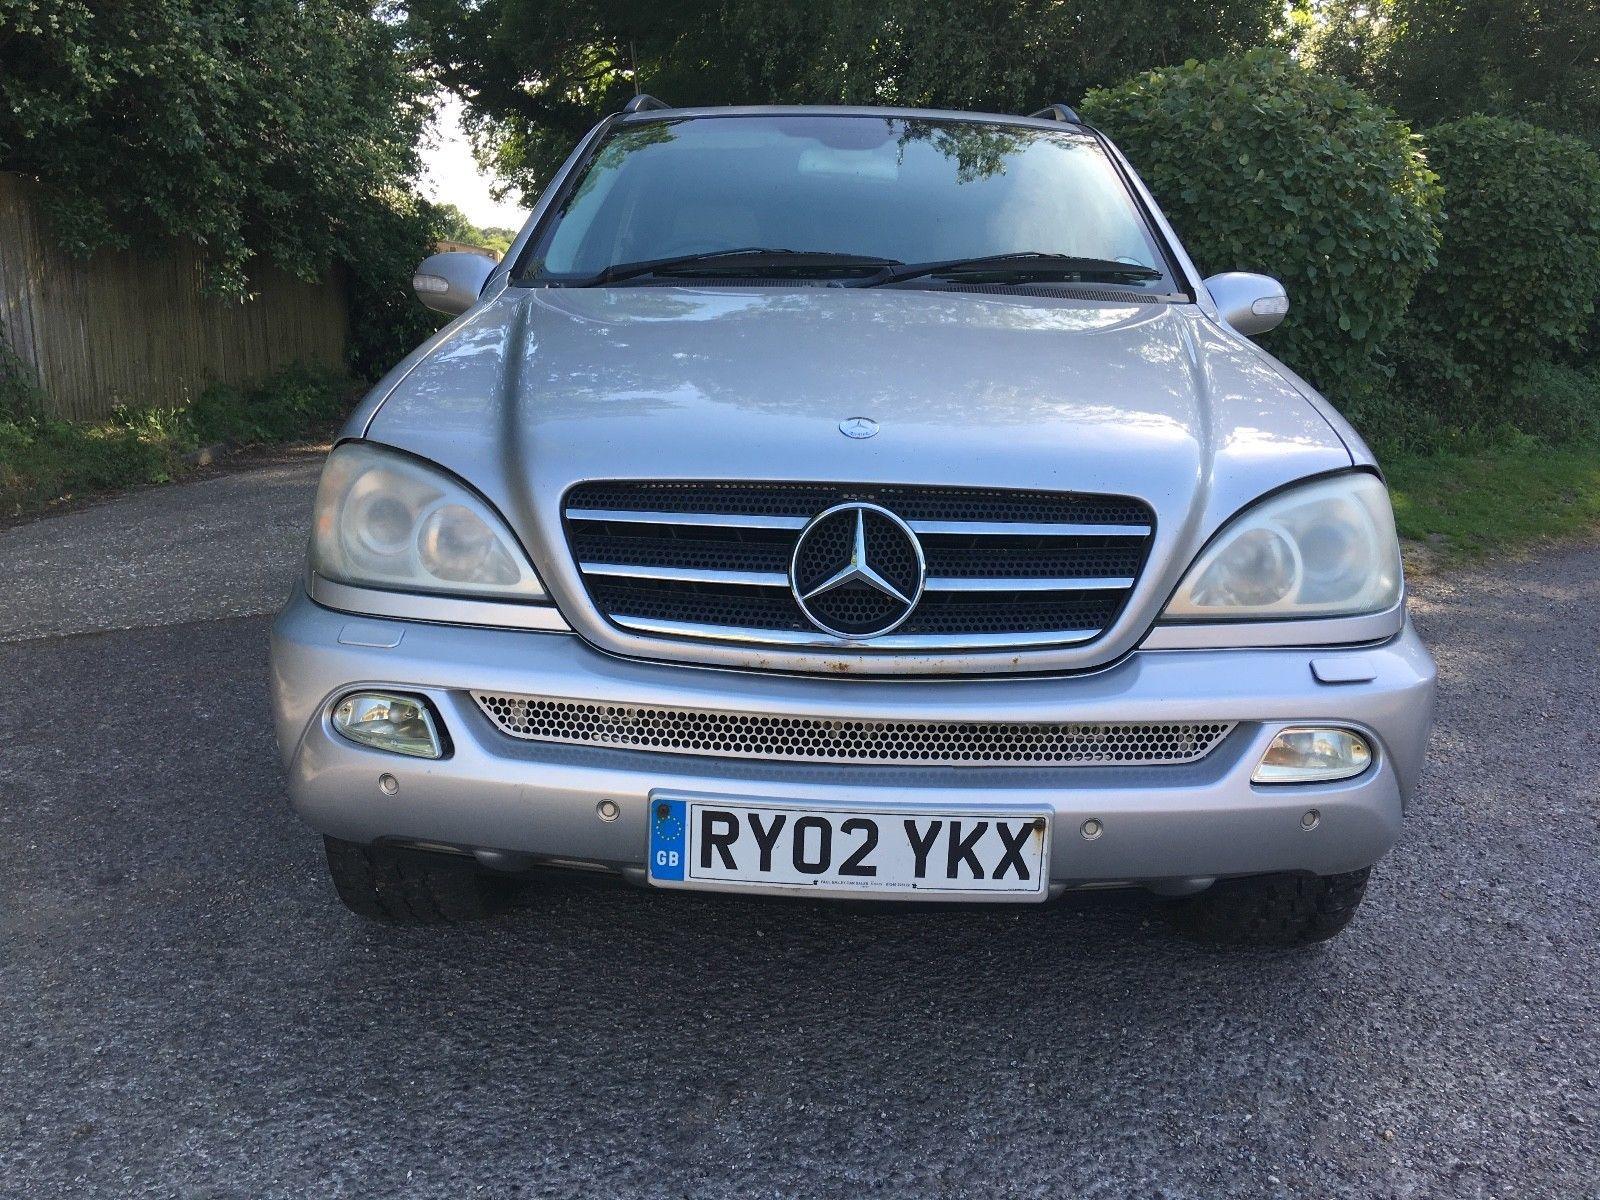 mercedes ml500 lpg runs drives spares or repair no mot 7 seater not rh pinterest com